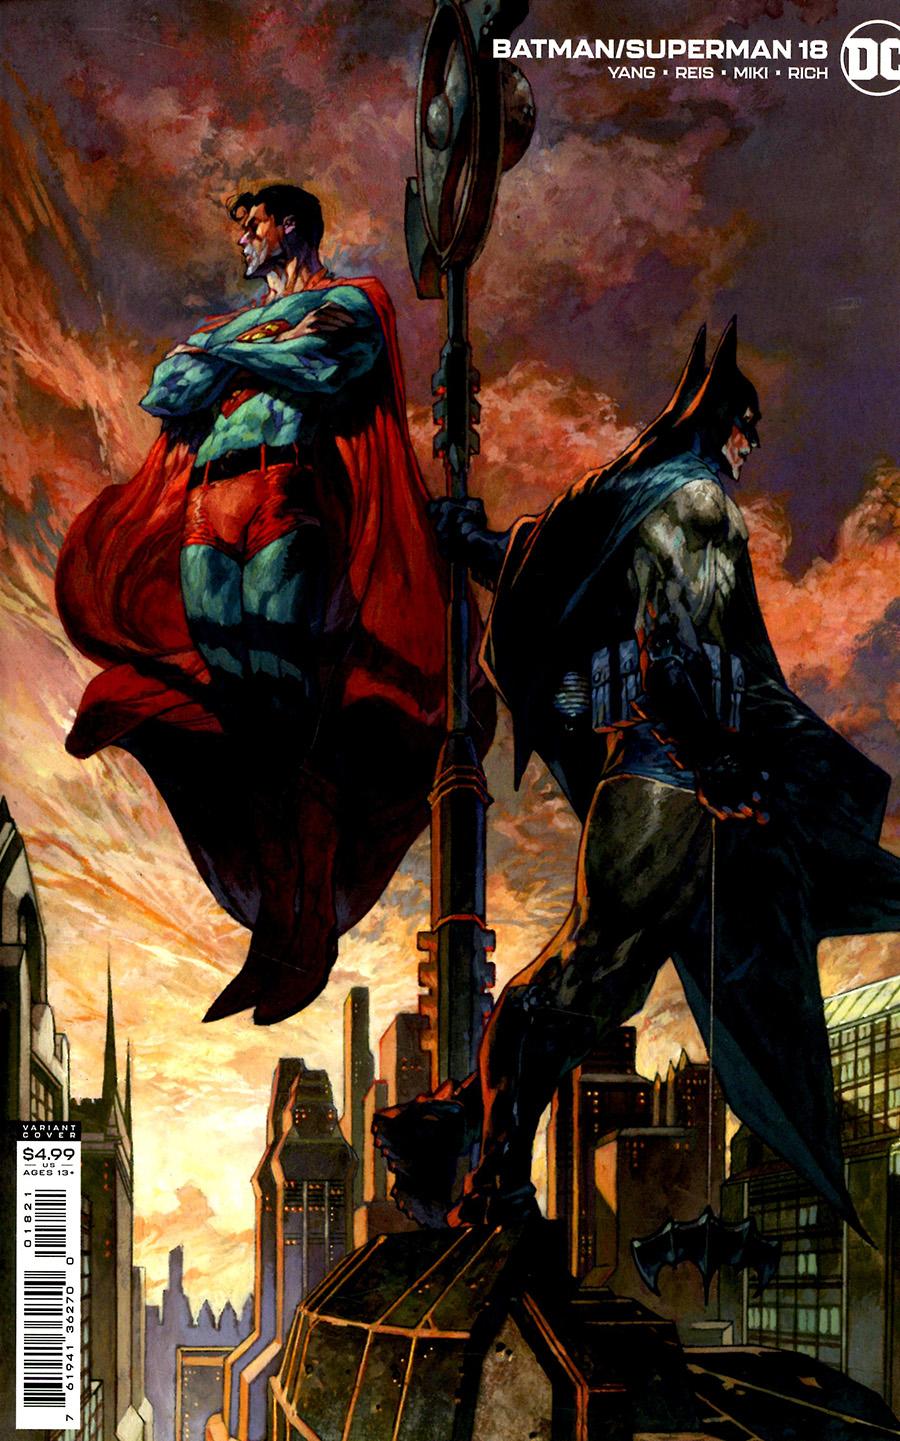 Batman Superman Vol 2 #18 Cover B Variant Simone Bianchi Card Stock Cover